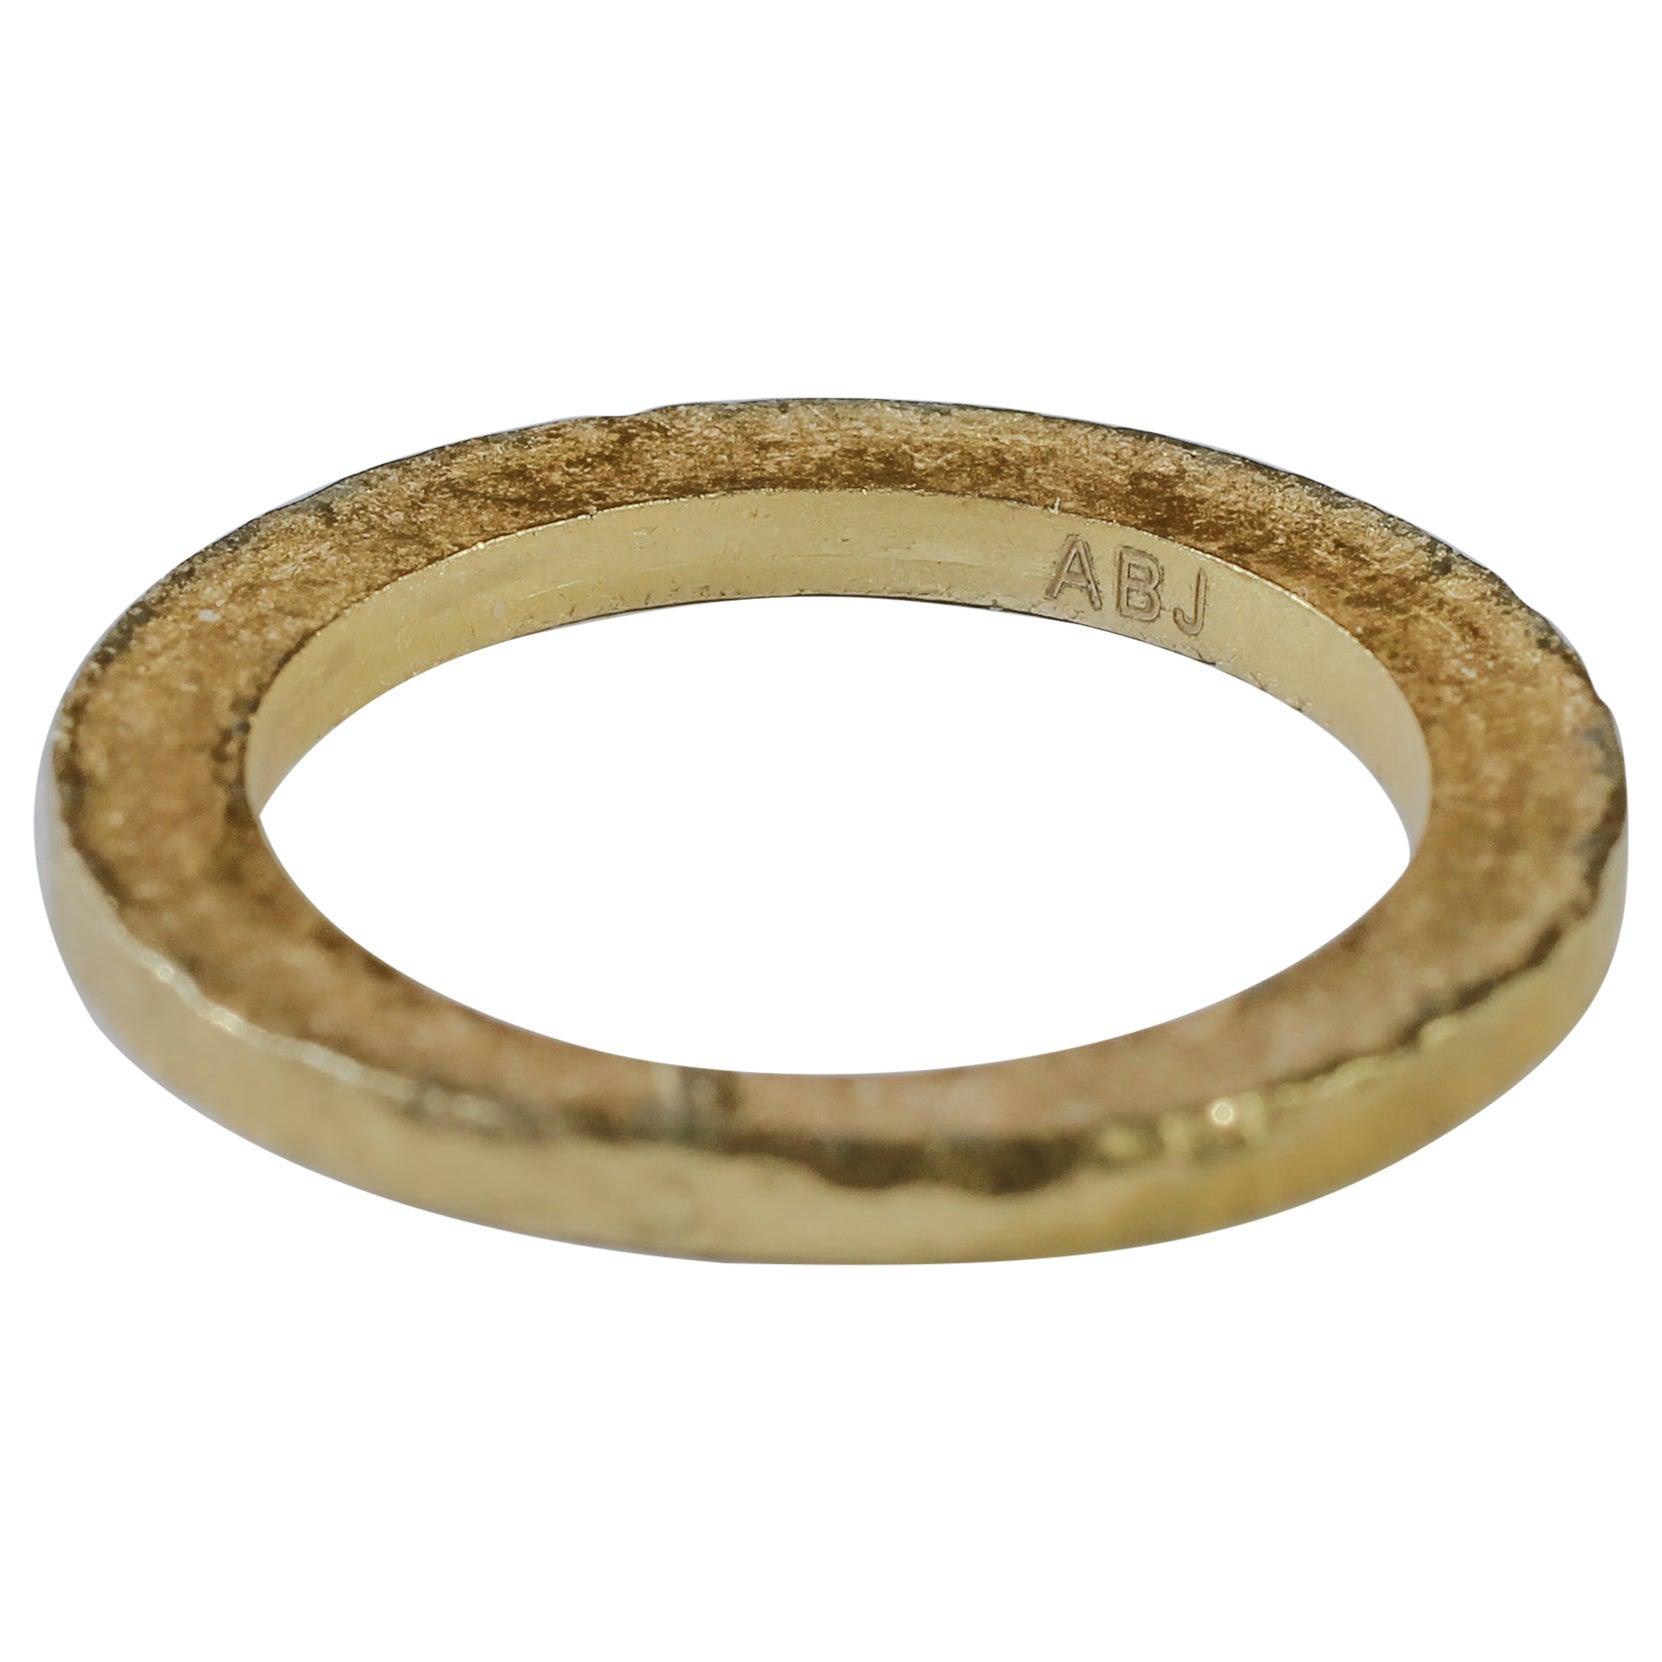 22K Recycled Gold Bridal Wedding Ring Alternative Stacking Fashion Design